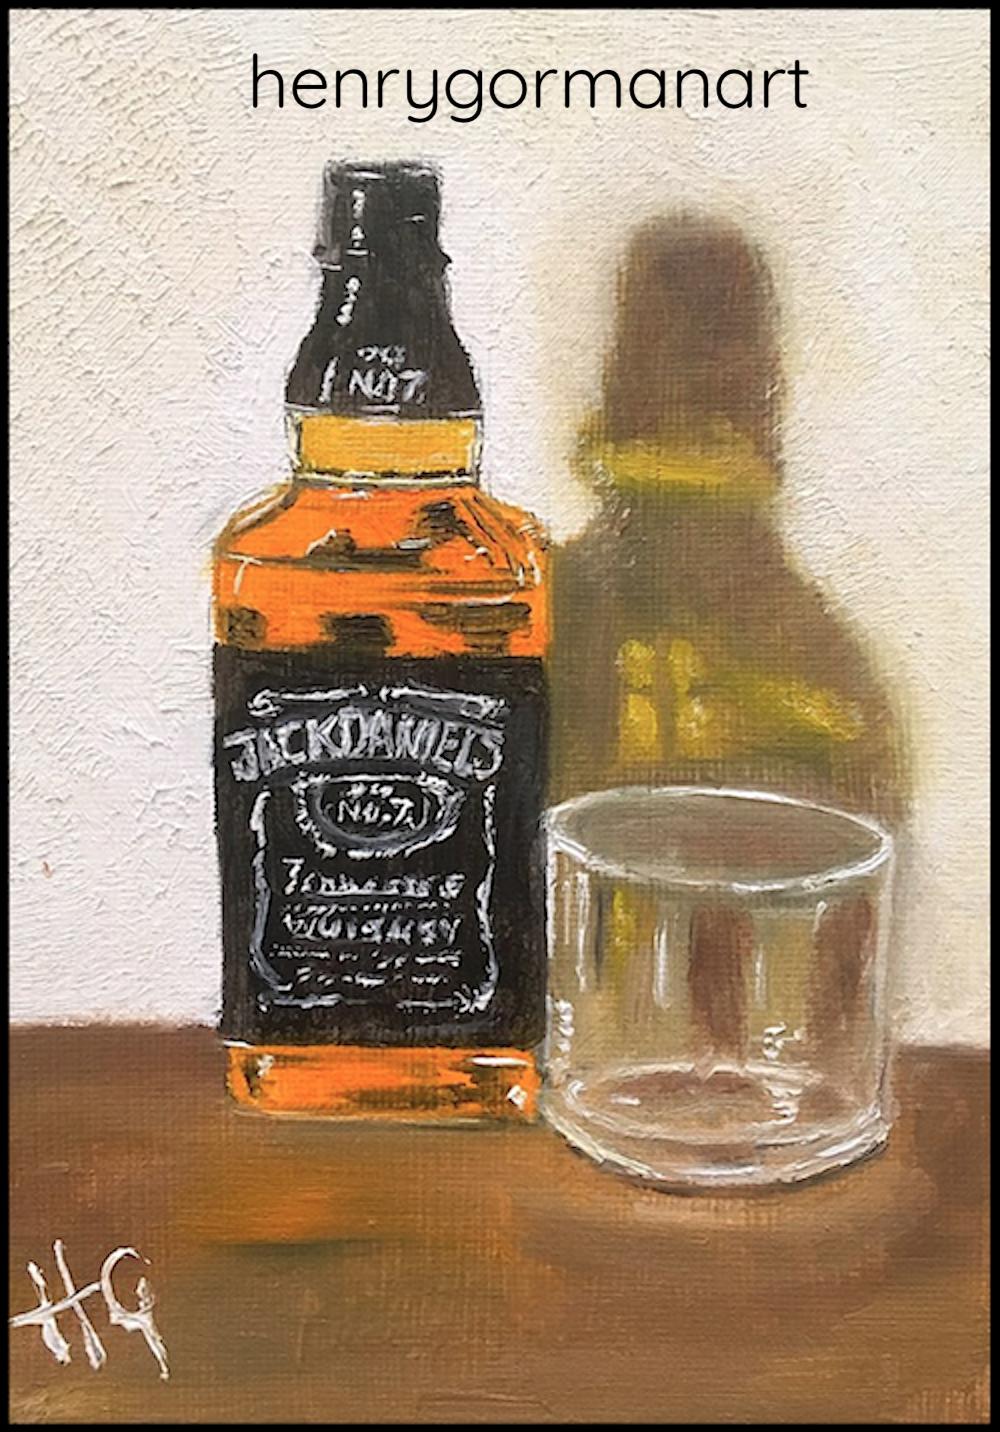 'Here's Jack'